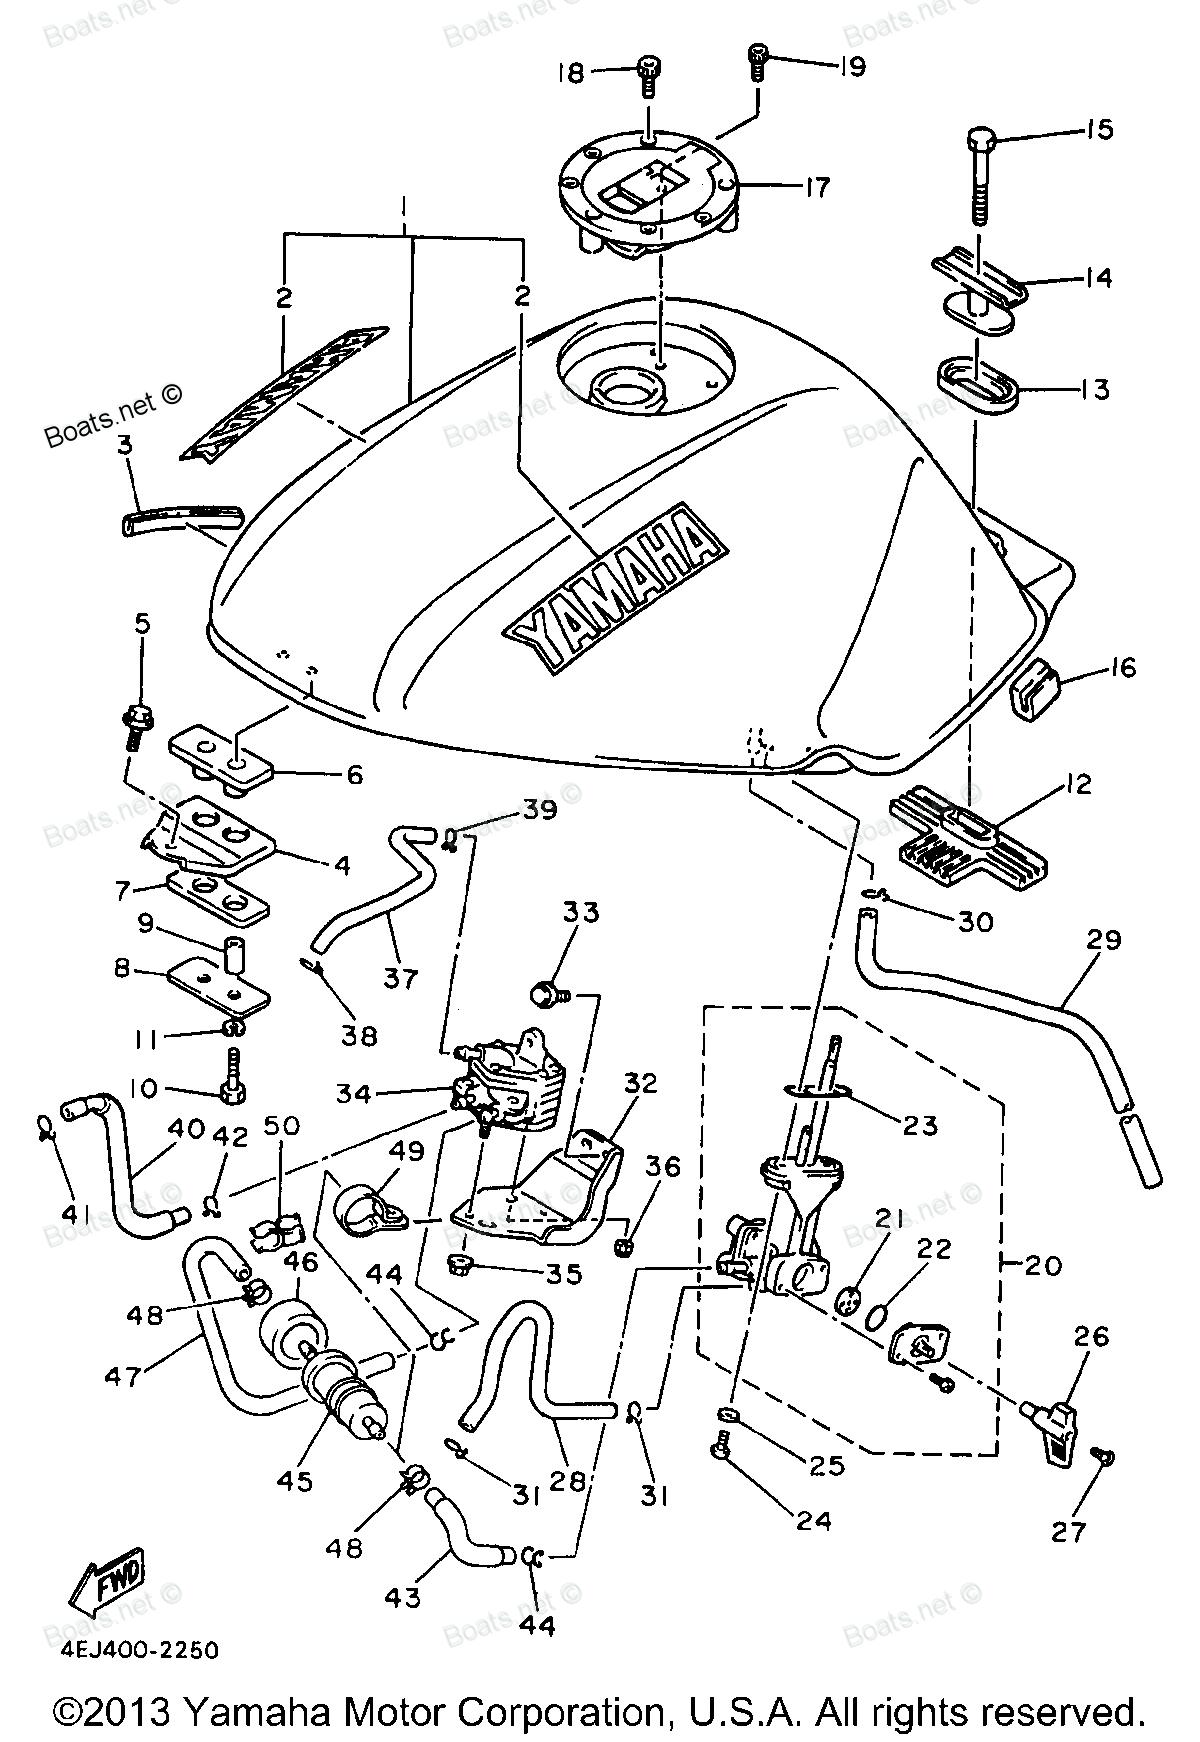 Seca 2 Yamaha Fuel System Diagram